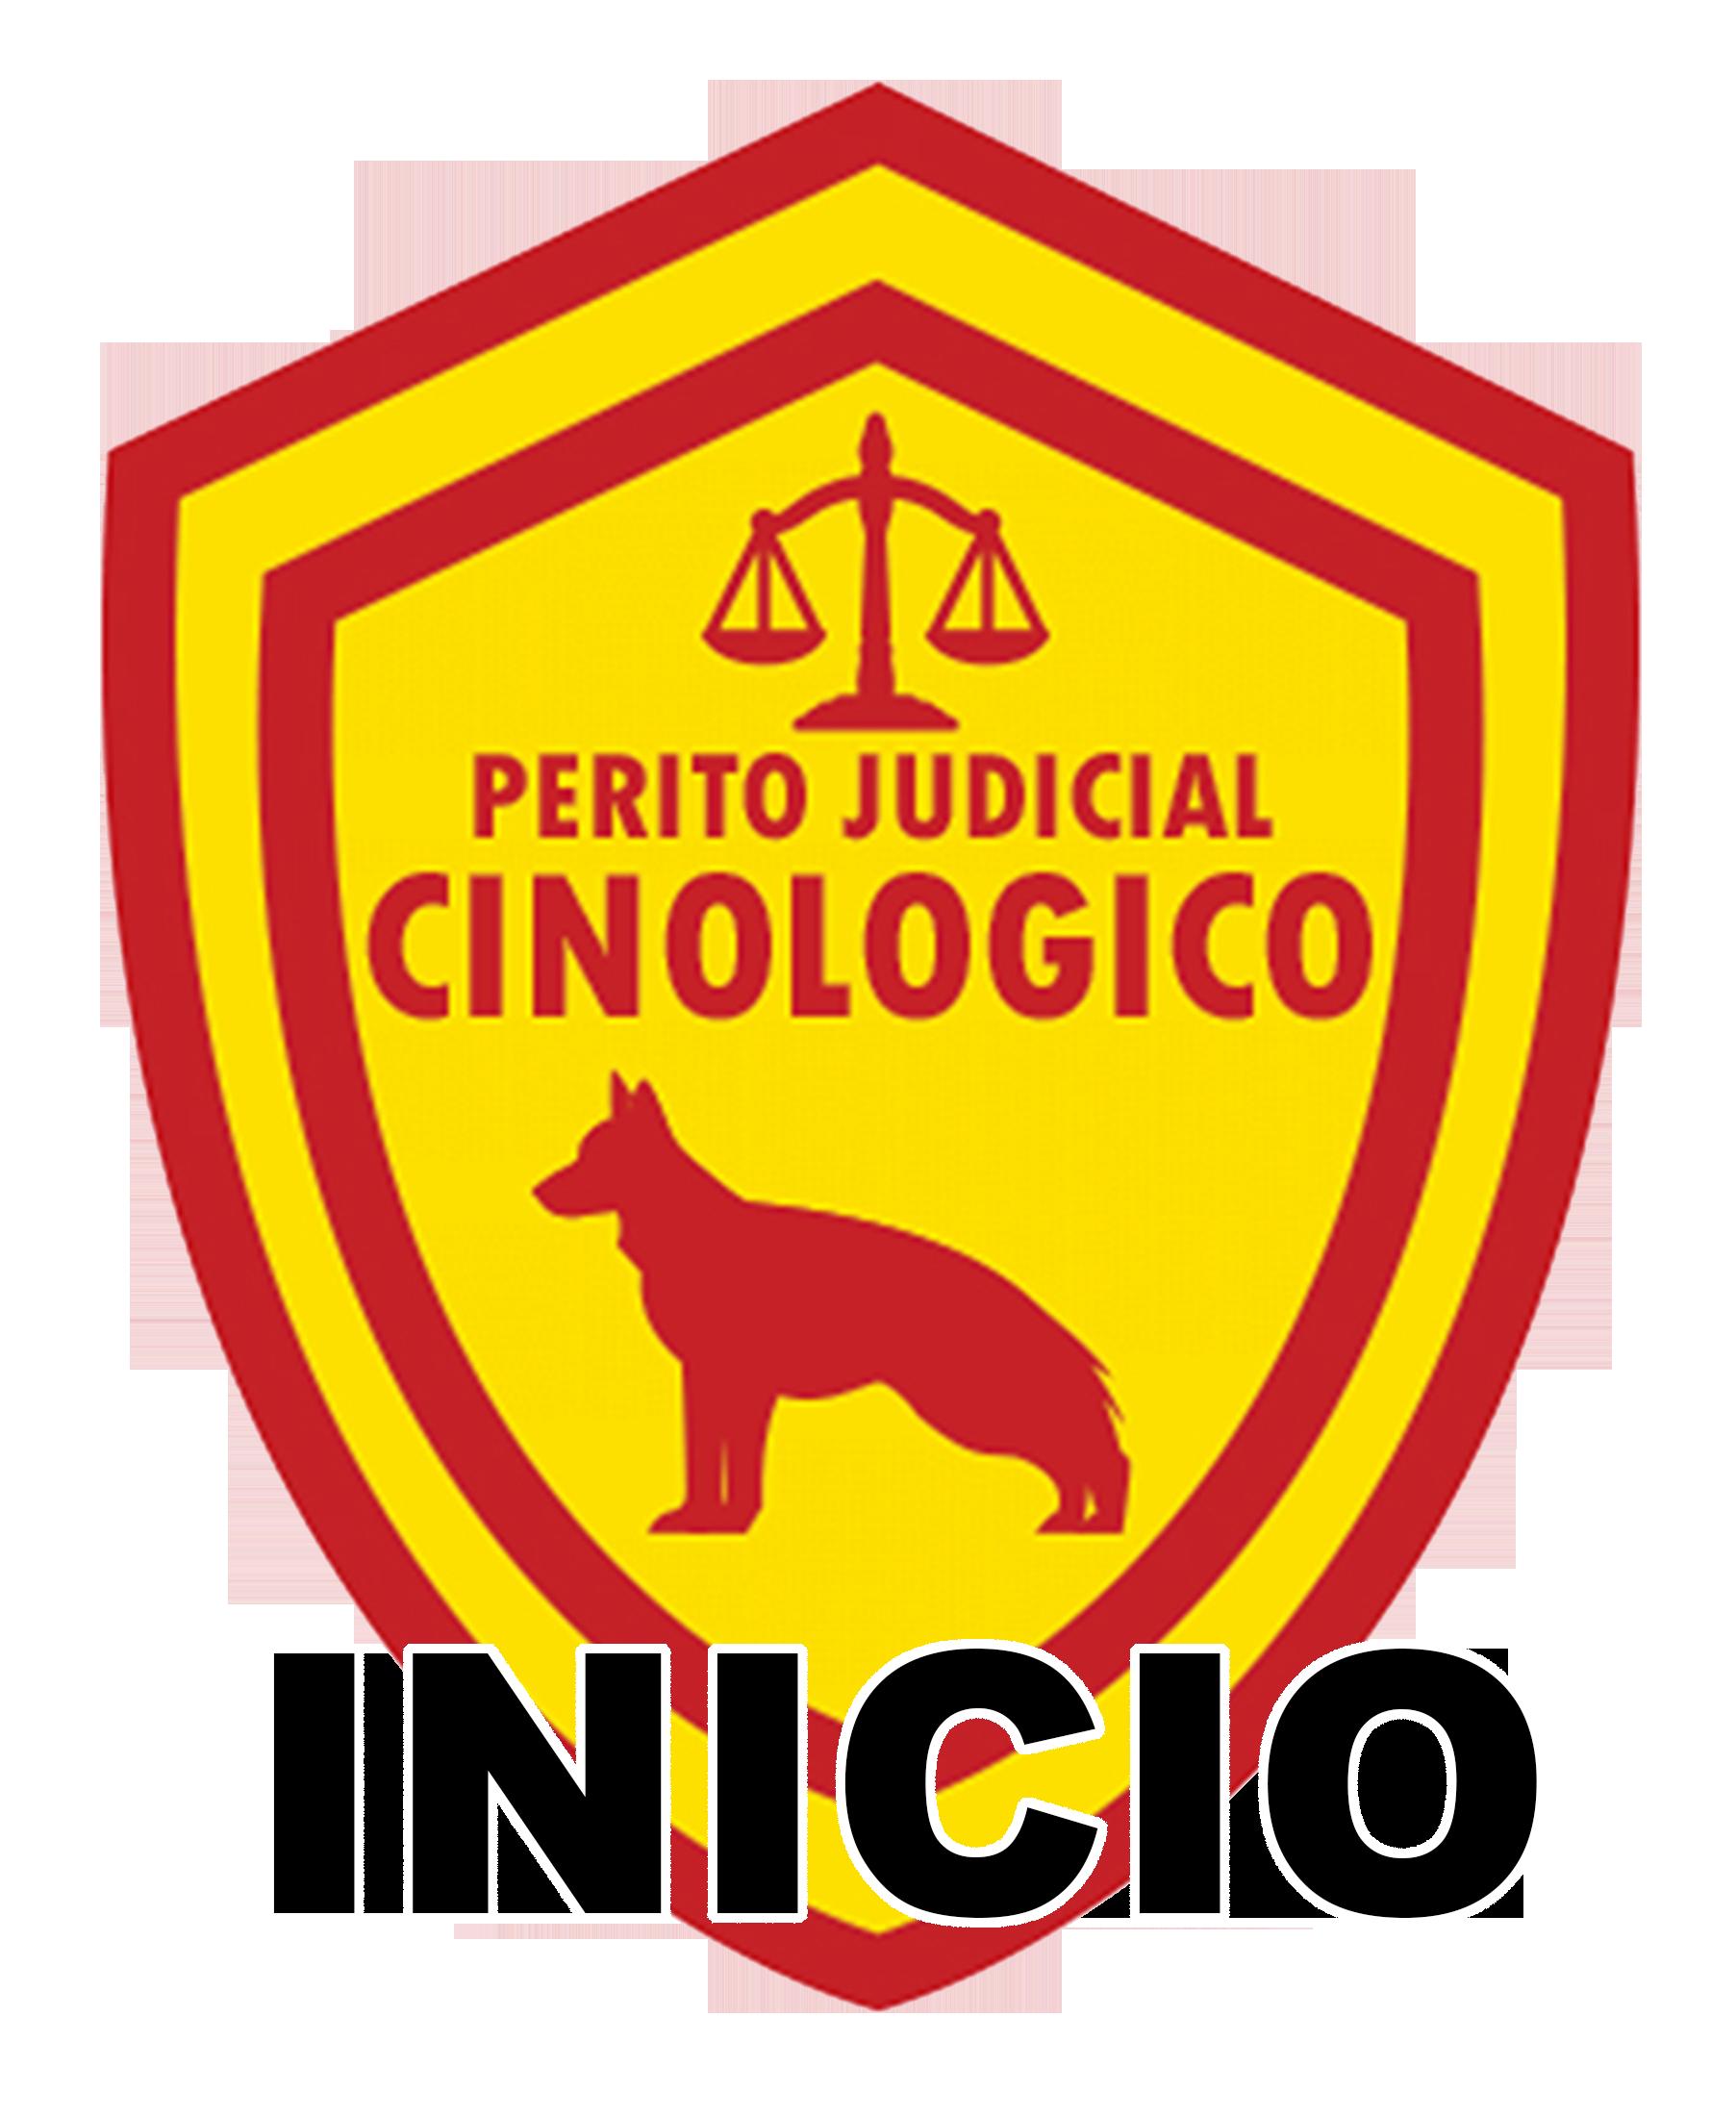 Perito Judicial Cinolgico